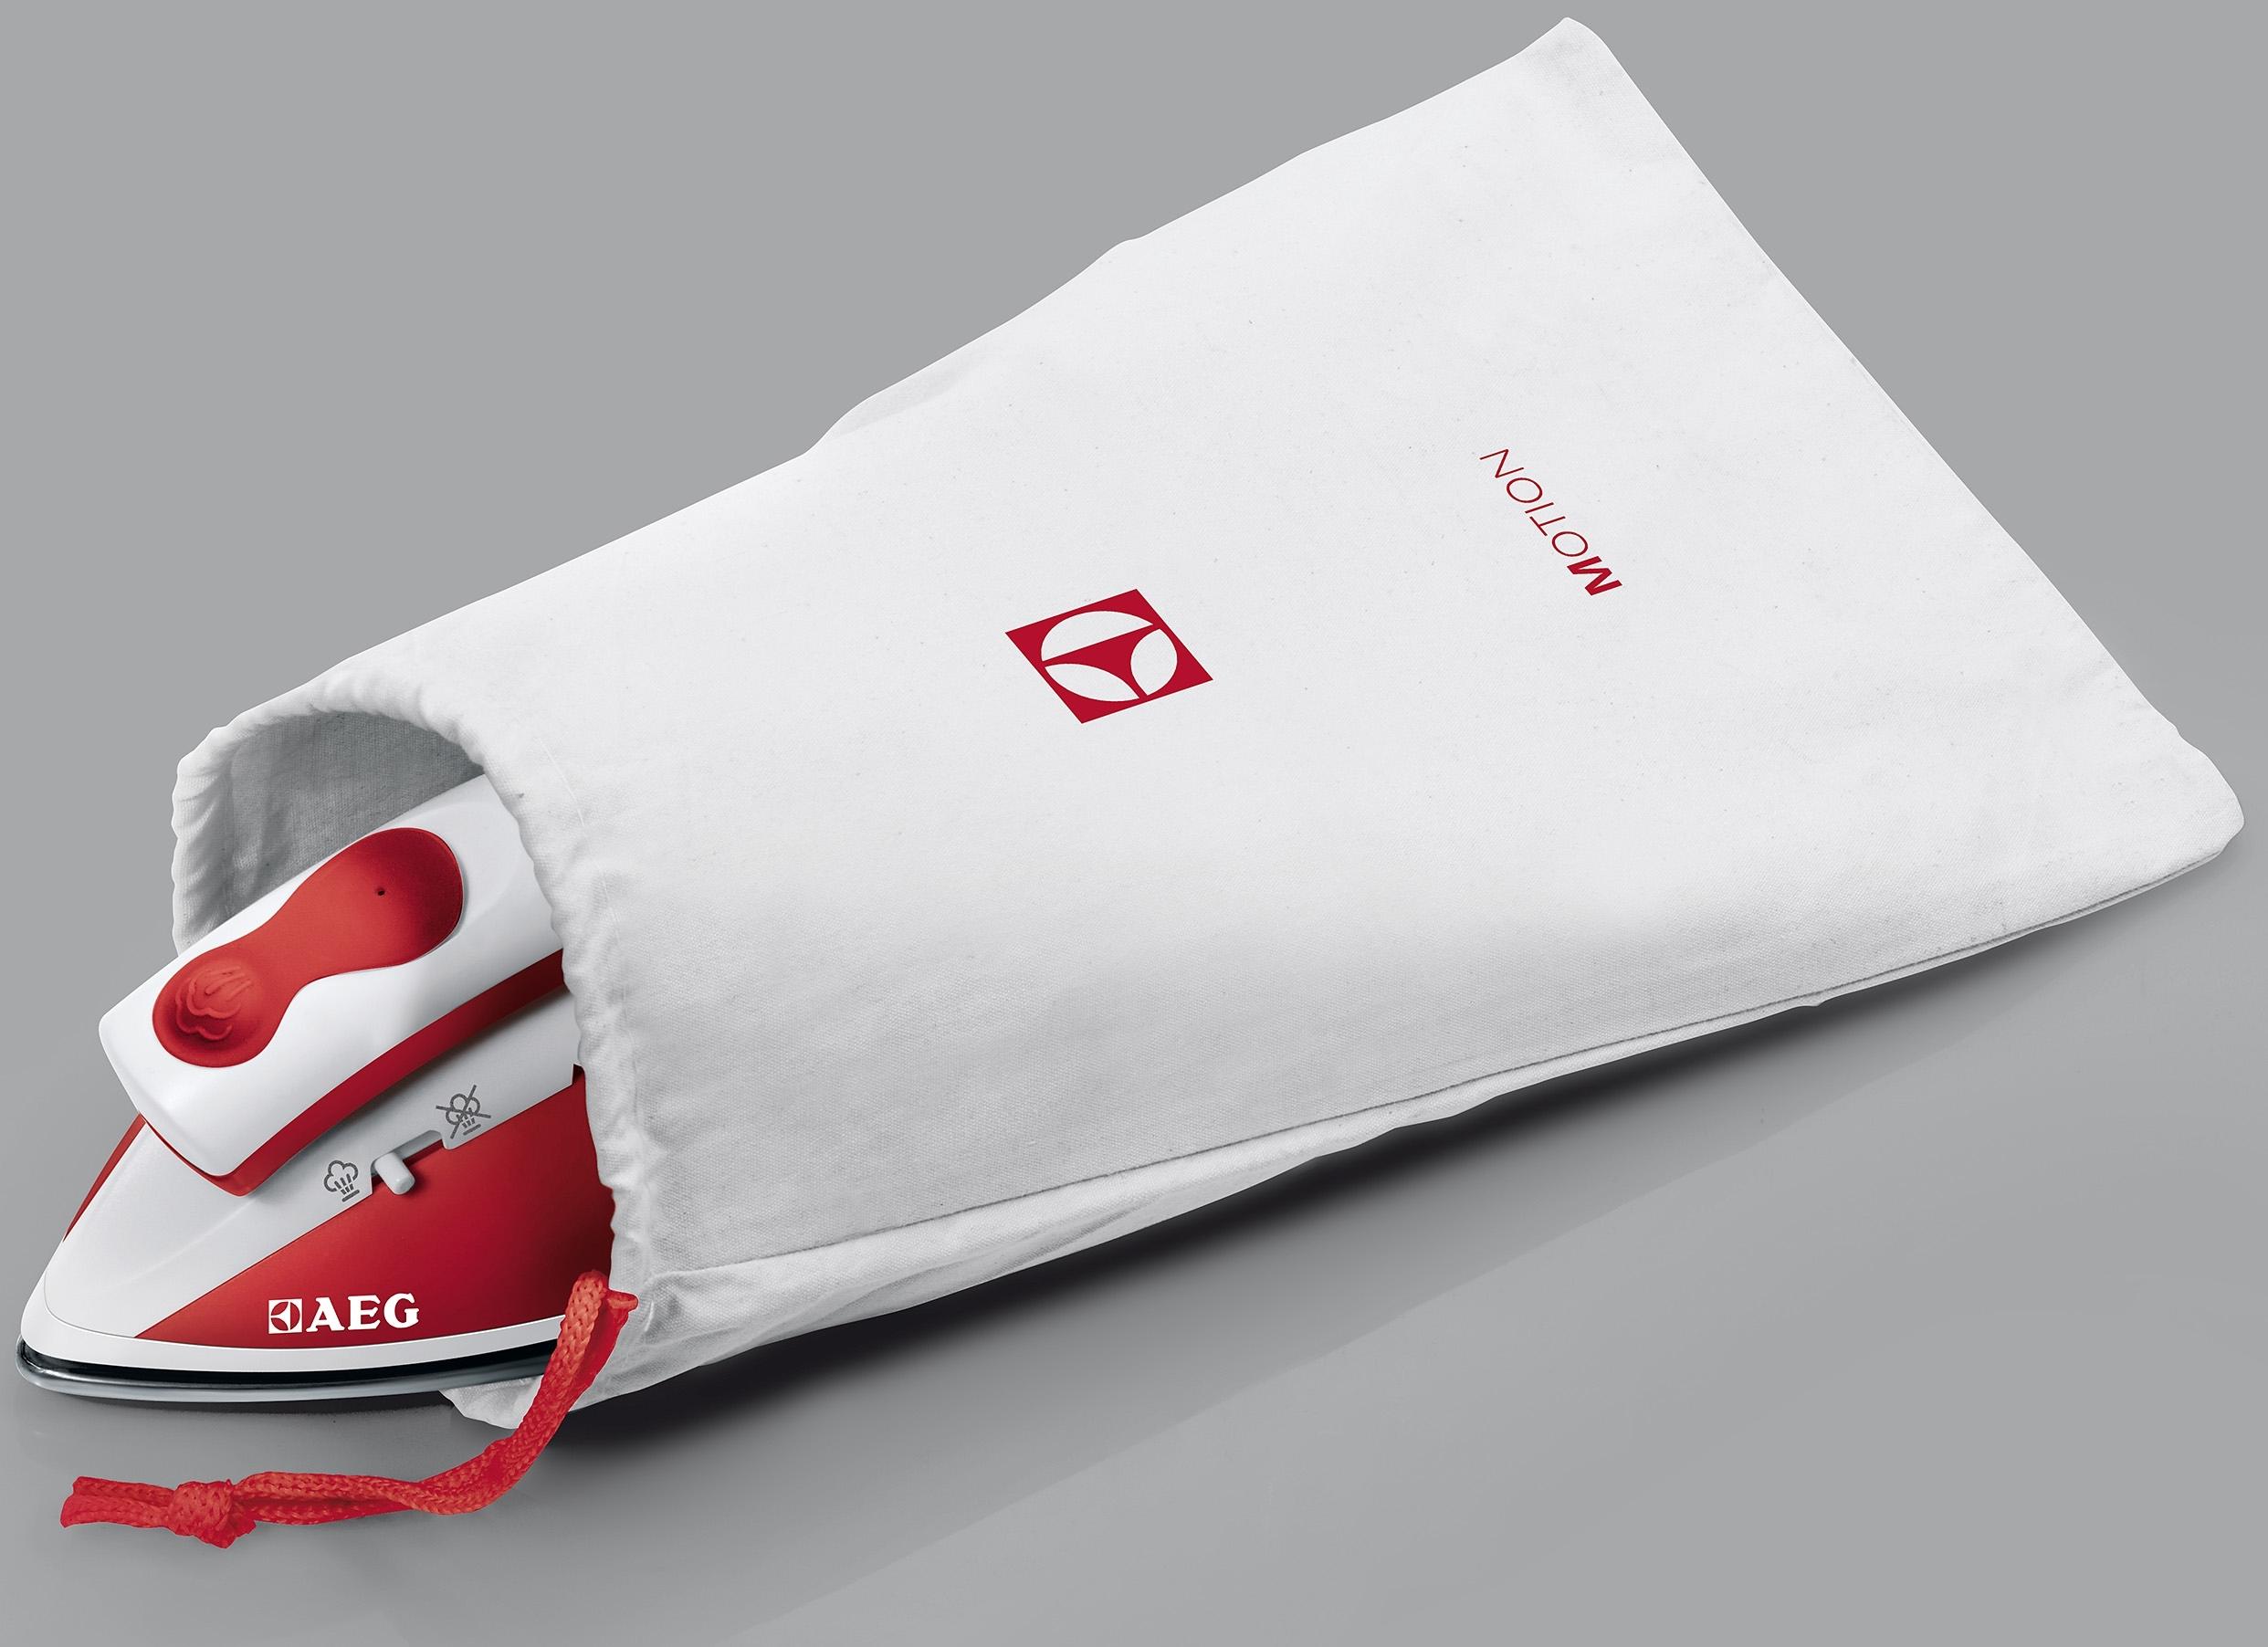 Welp AEG Reis-strijkijzer DBT 800 snel online gekocht | OTTO IU-45